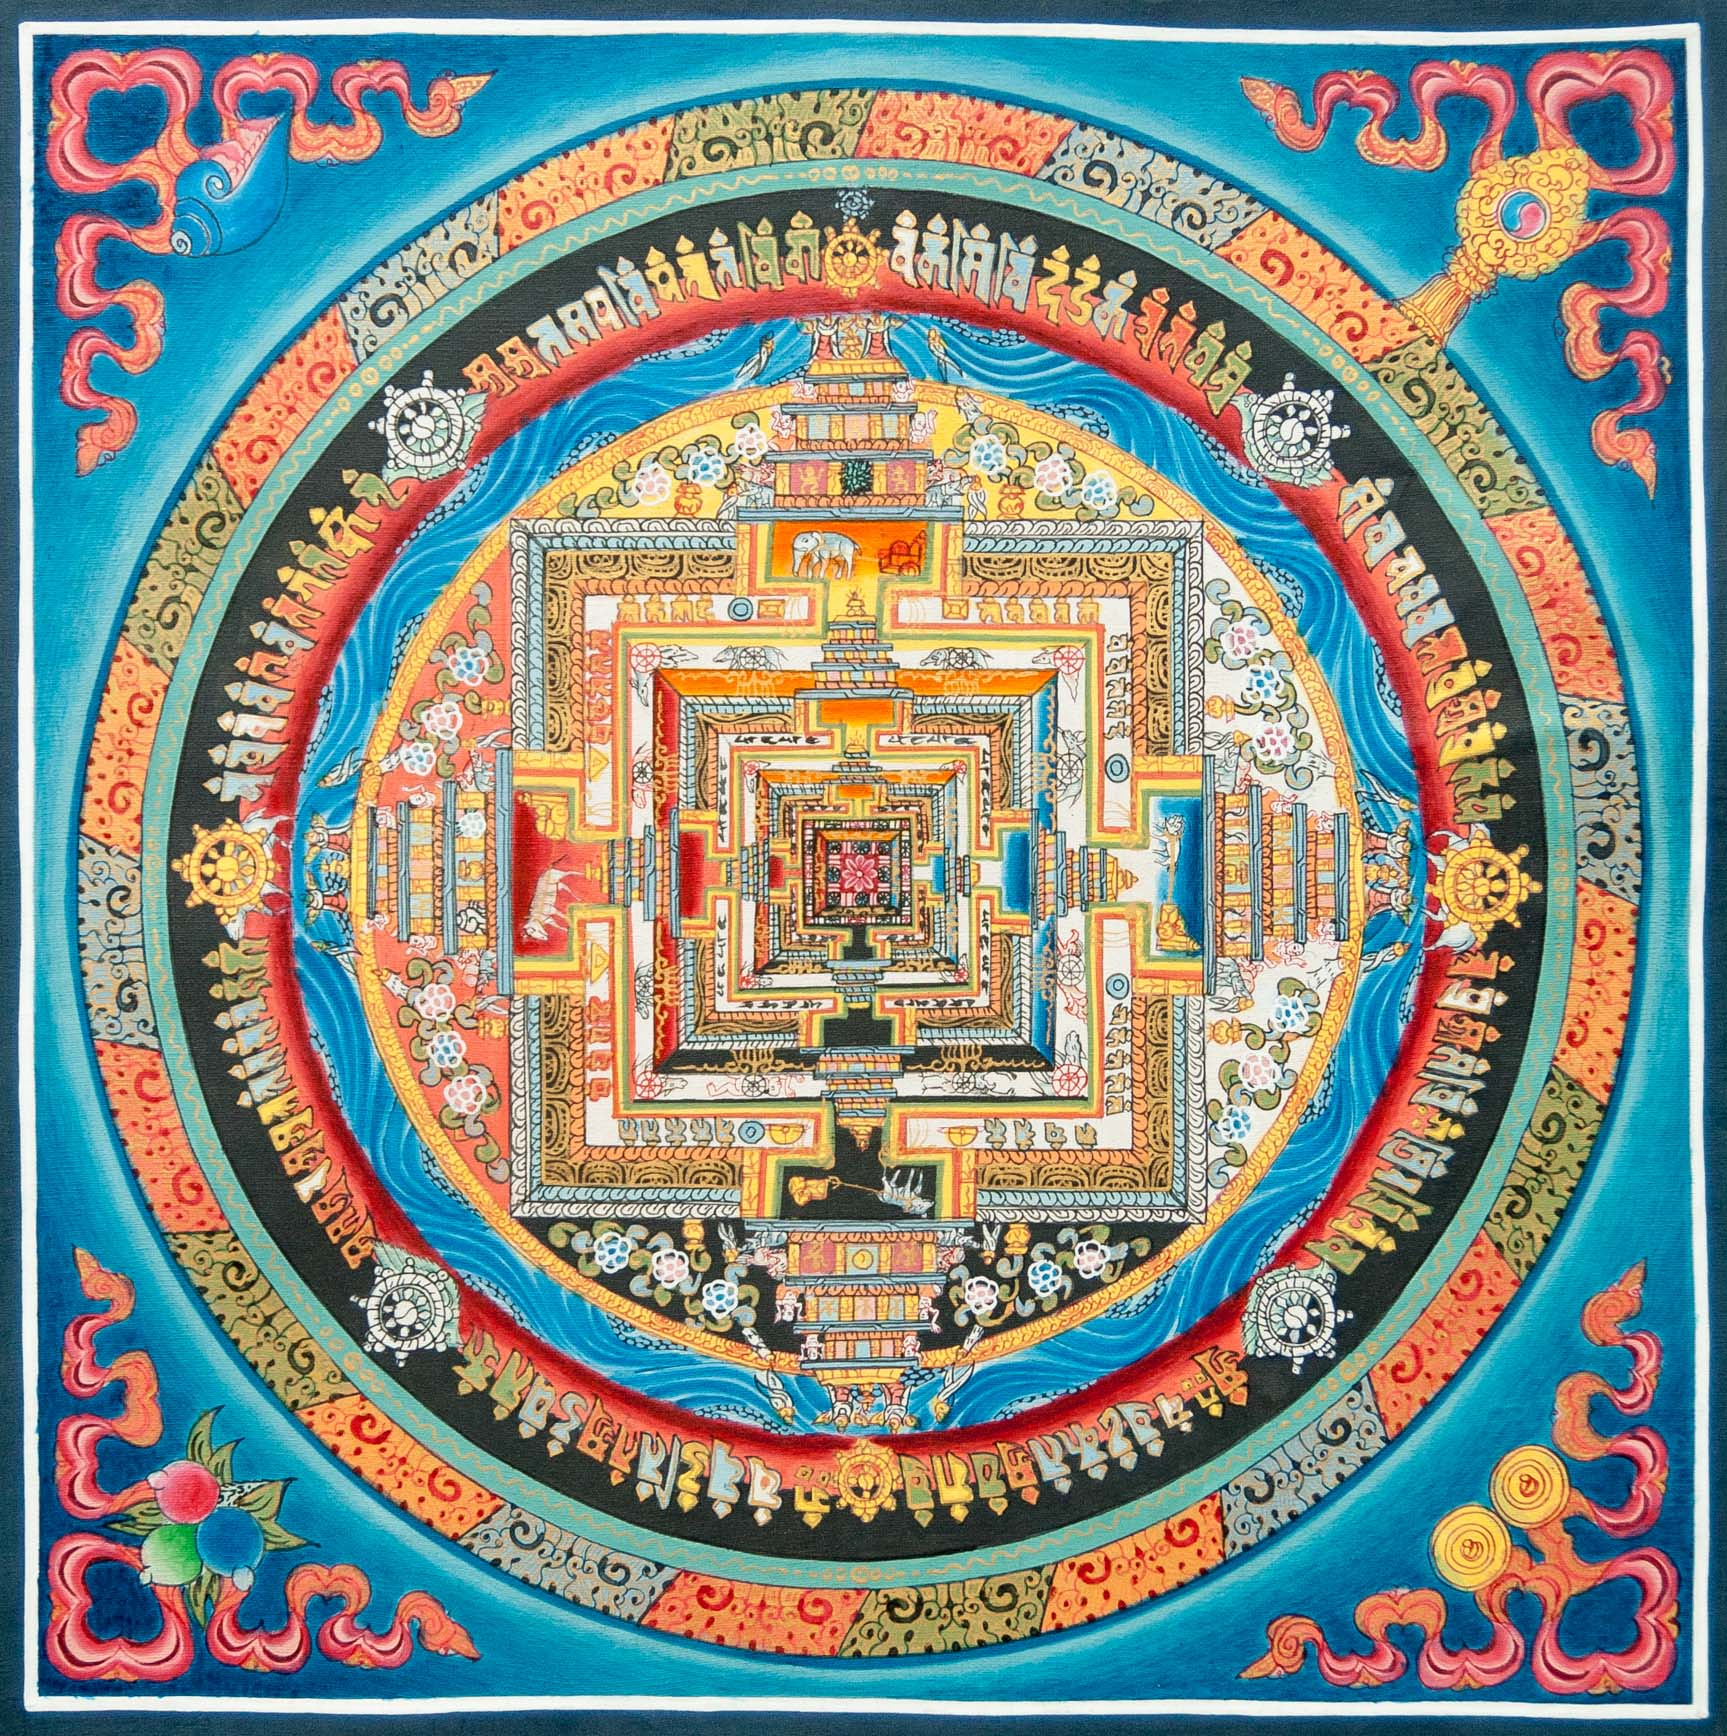 Auspicious-Symbols-Kalachakra.jpg